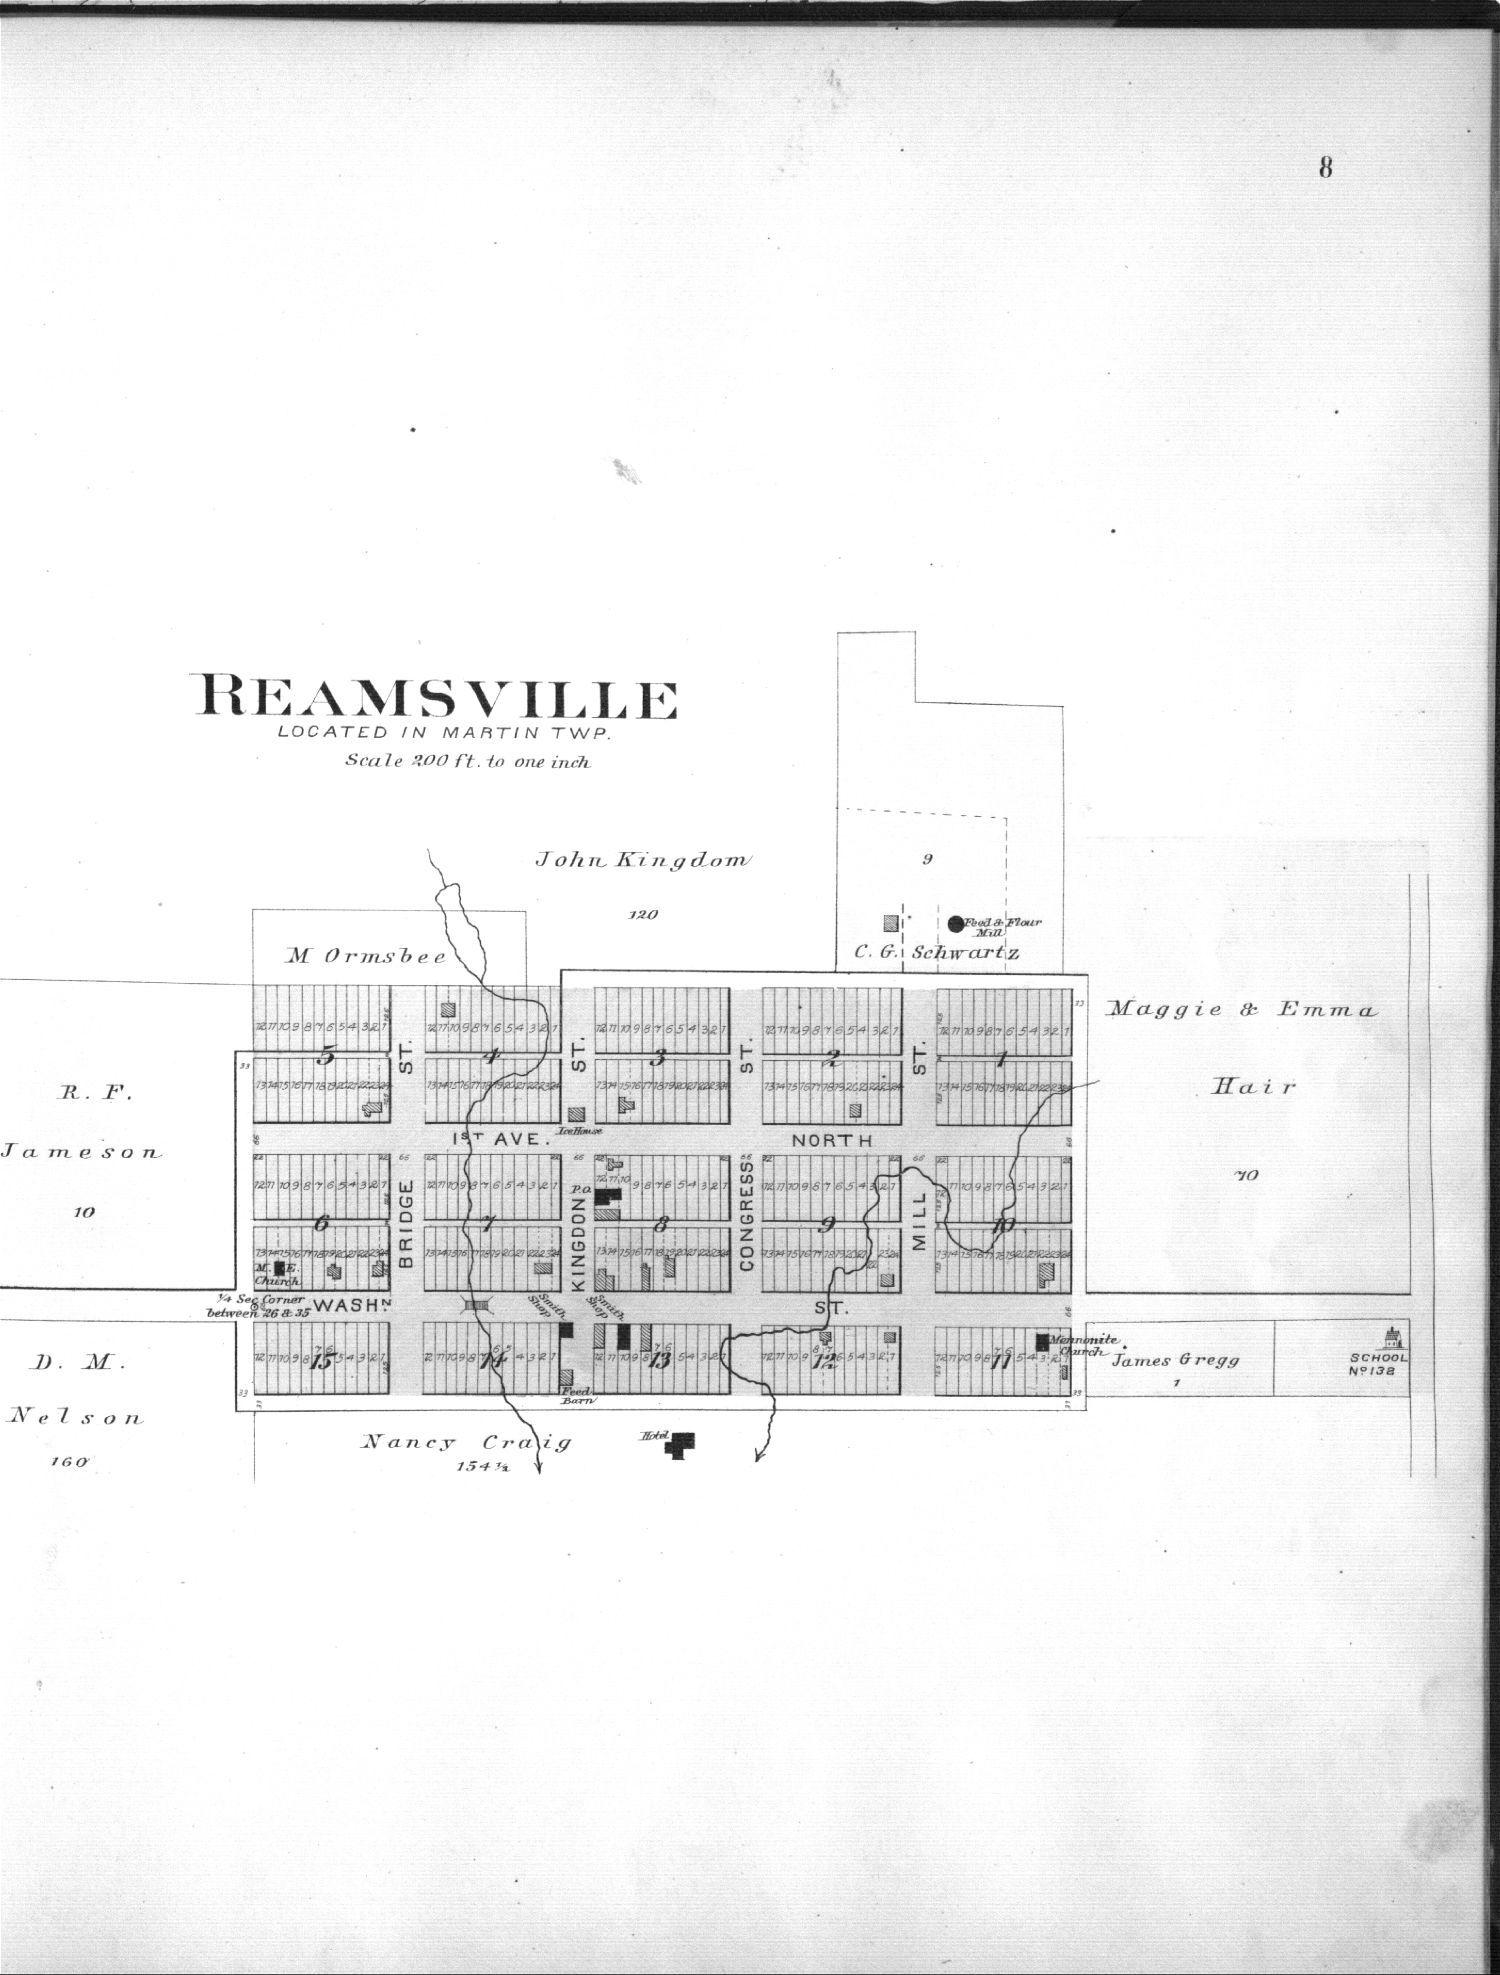 Plat book, Smith County, Kansas - 8